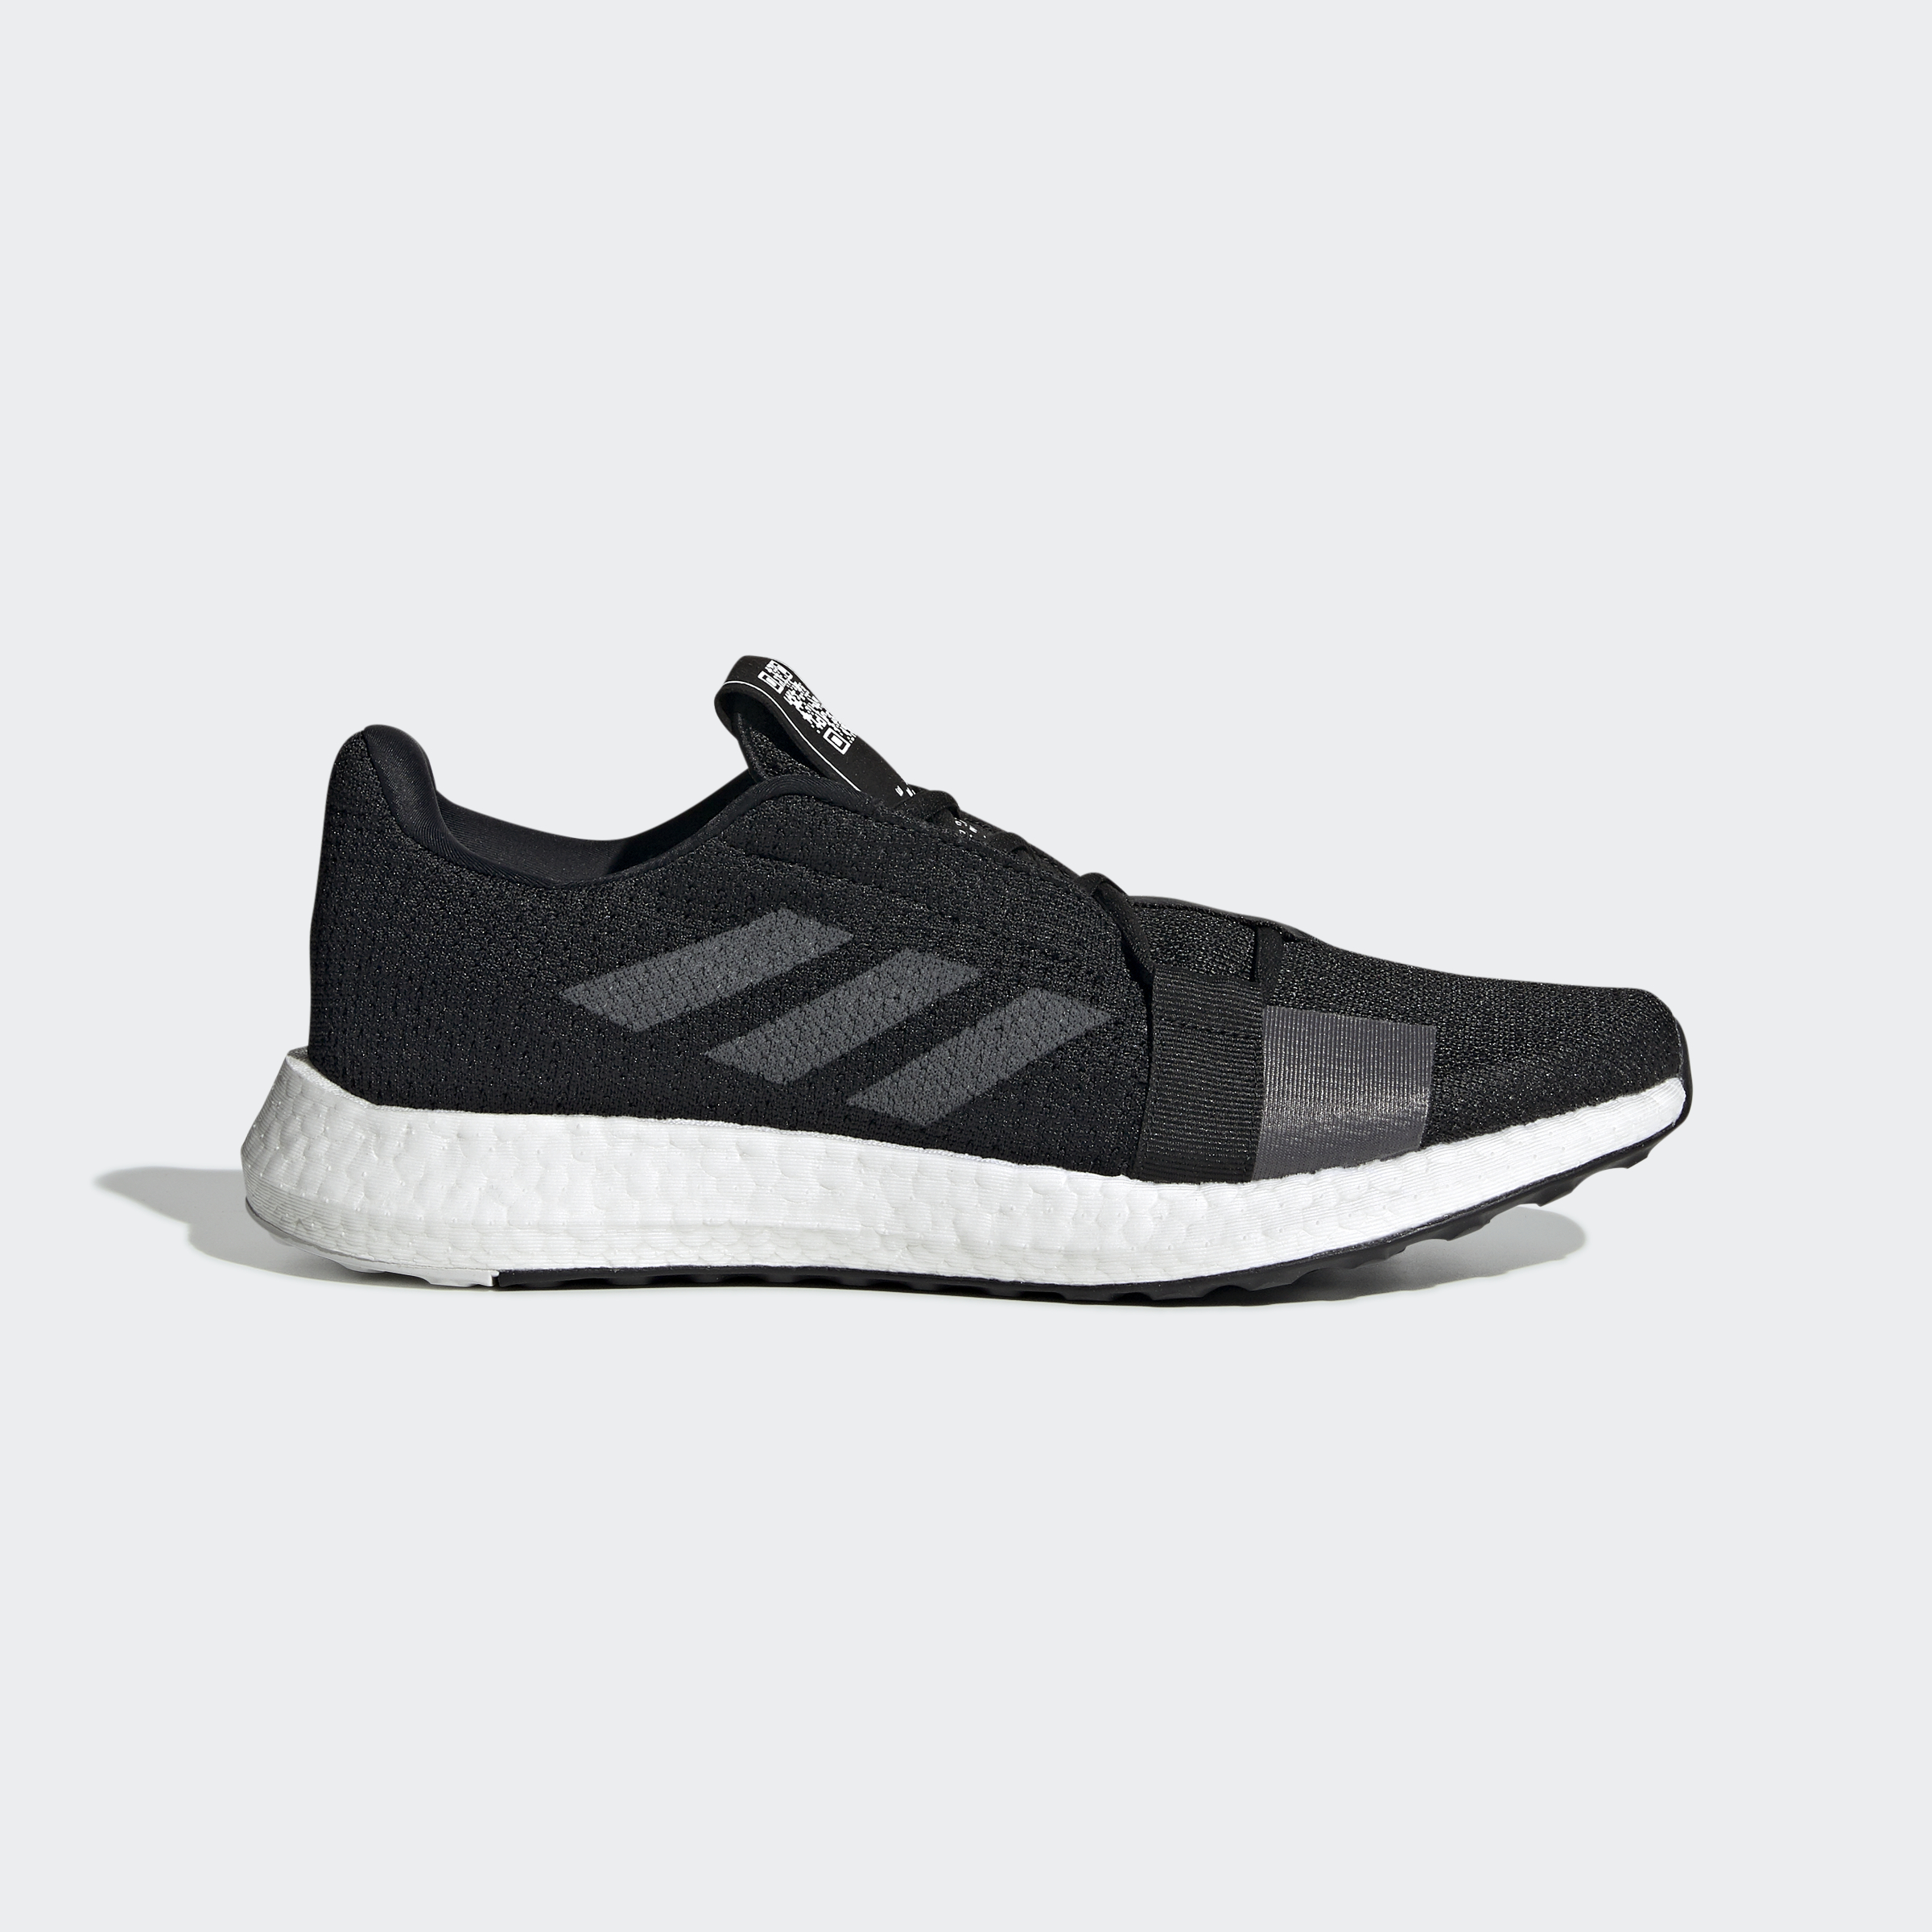 miniature 20 - adidas Senseboost Go Shoes Men's Athletic & Sneakers